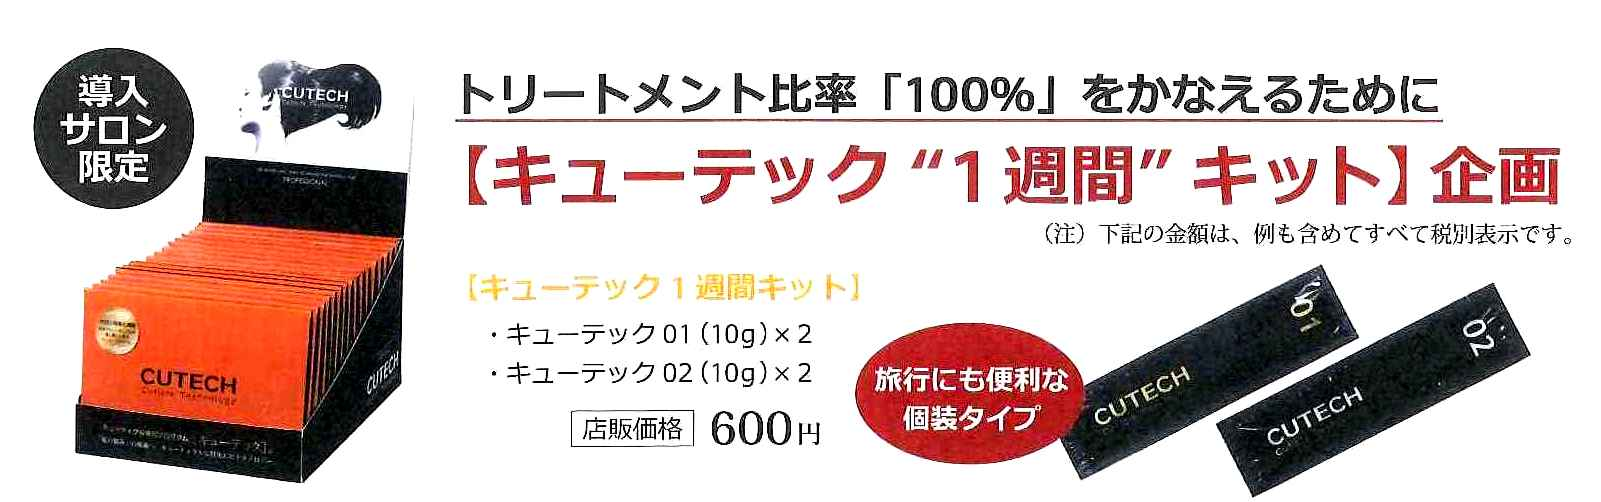 201404251109_0001